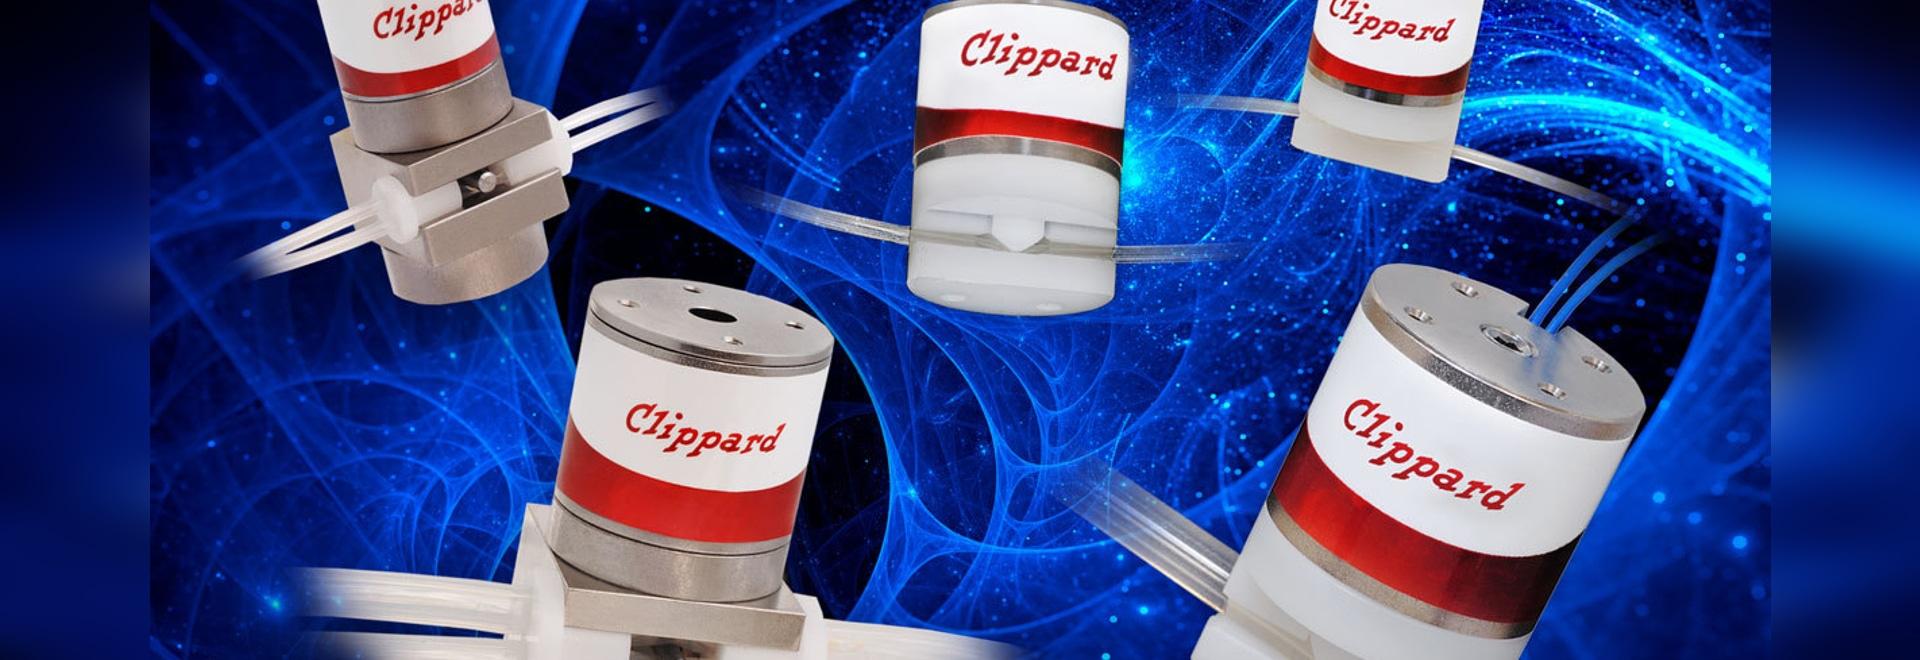 Clippard NPV Series 3/2 Miniature Pinch Valves